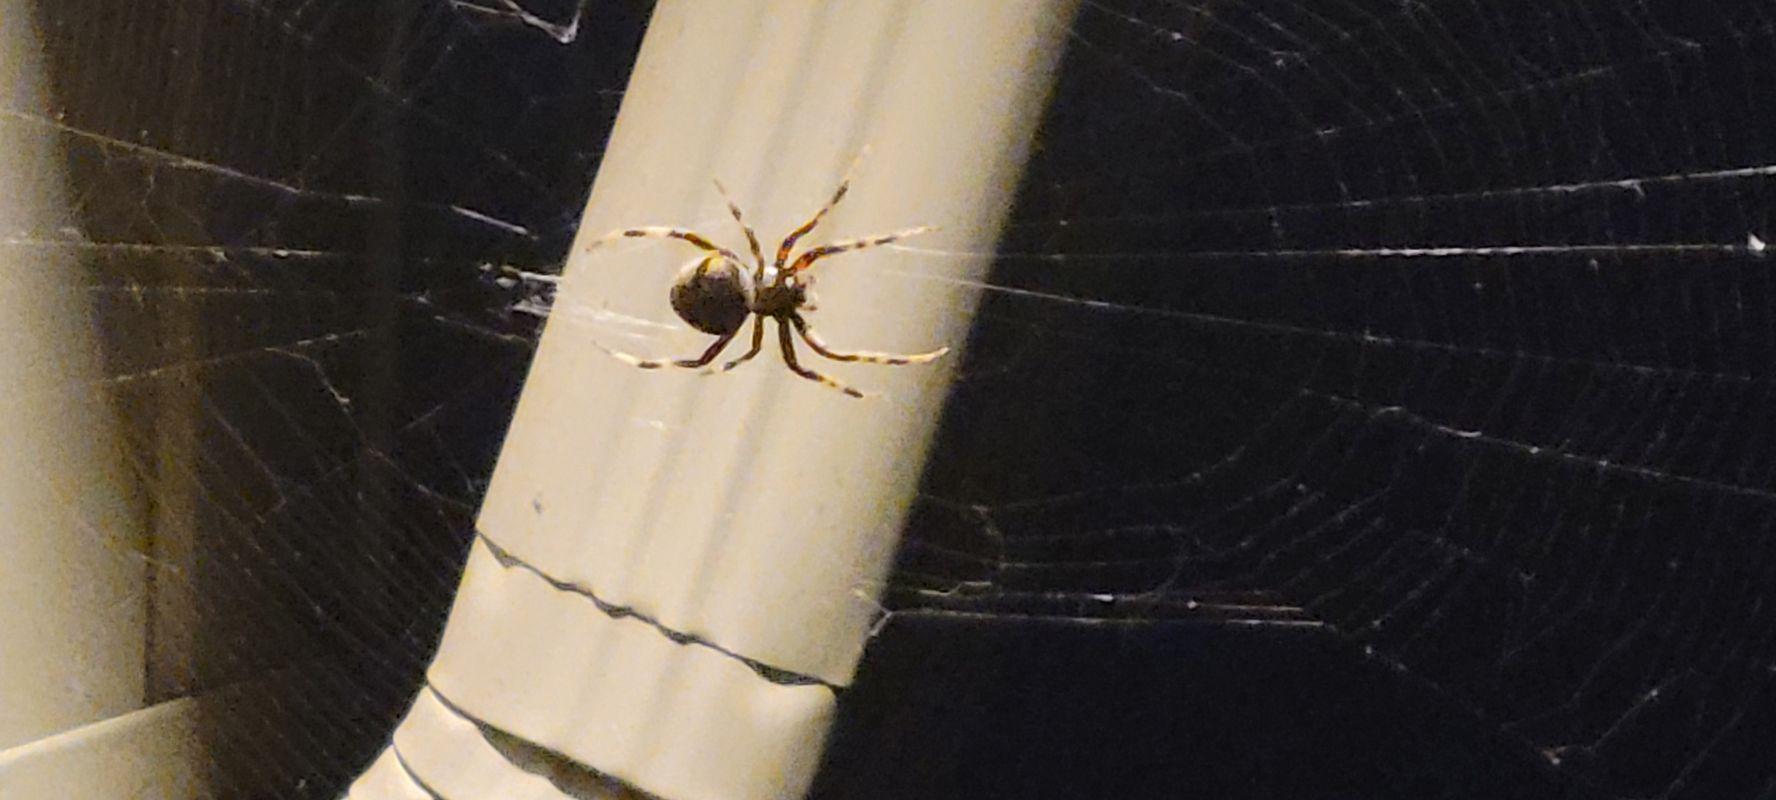 Spider night 20210912_204703